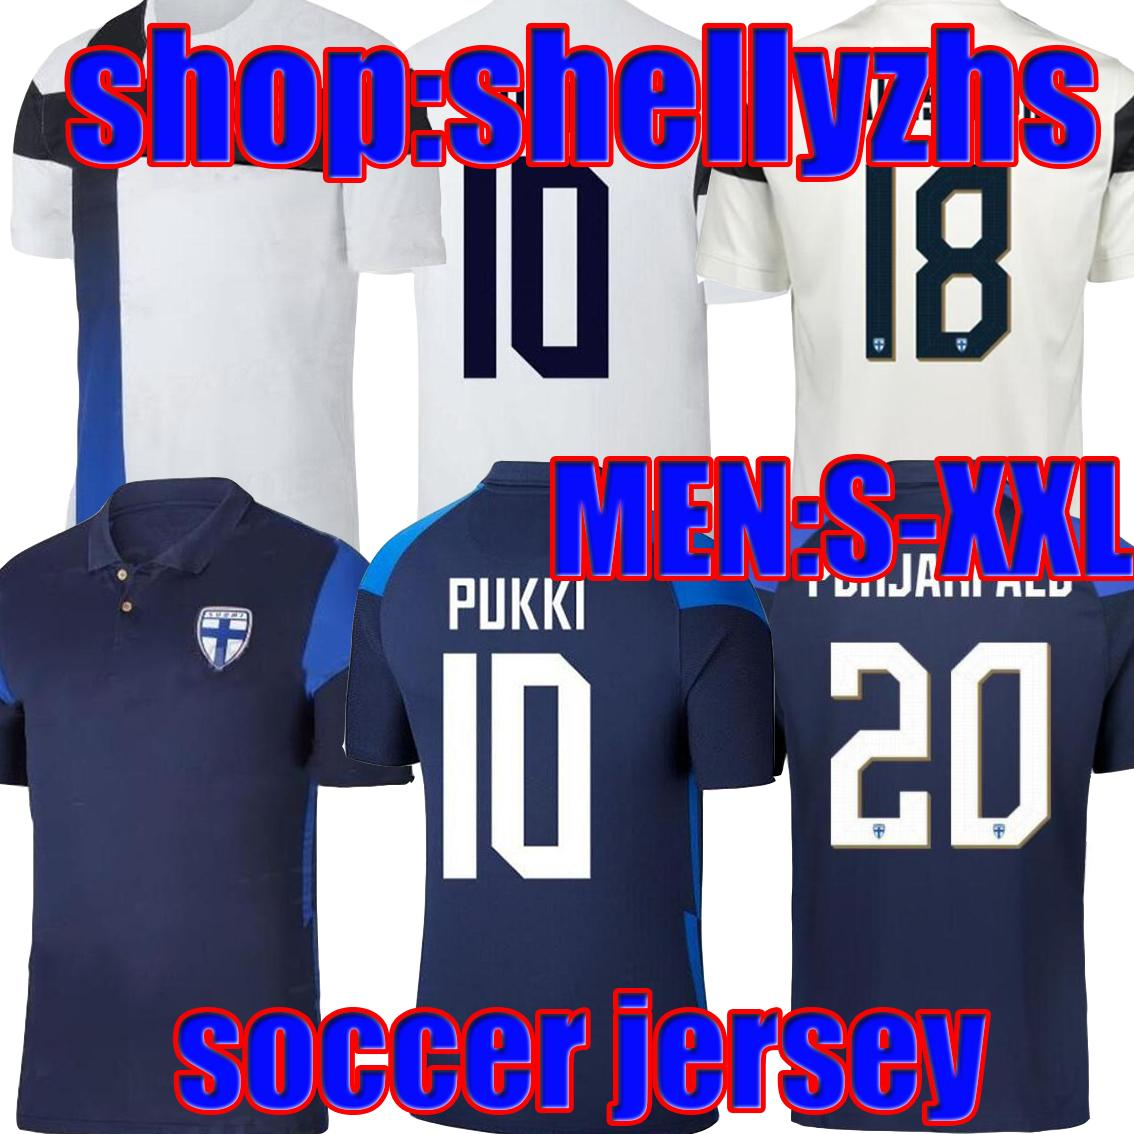 20 21 Finland Soccer Jersey 2021 Hommes Home Home Blanc Pukki Kemppi Engman Hradecky Football Chemises Uniformes